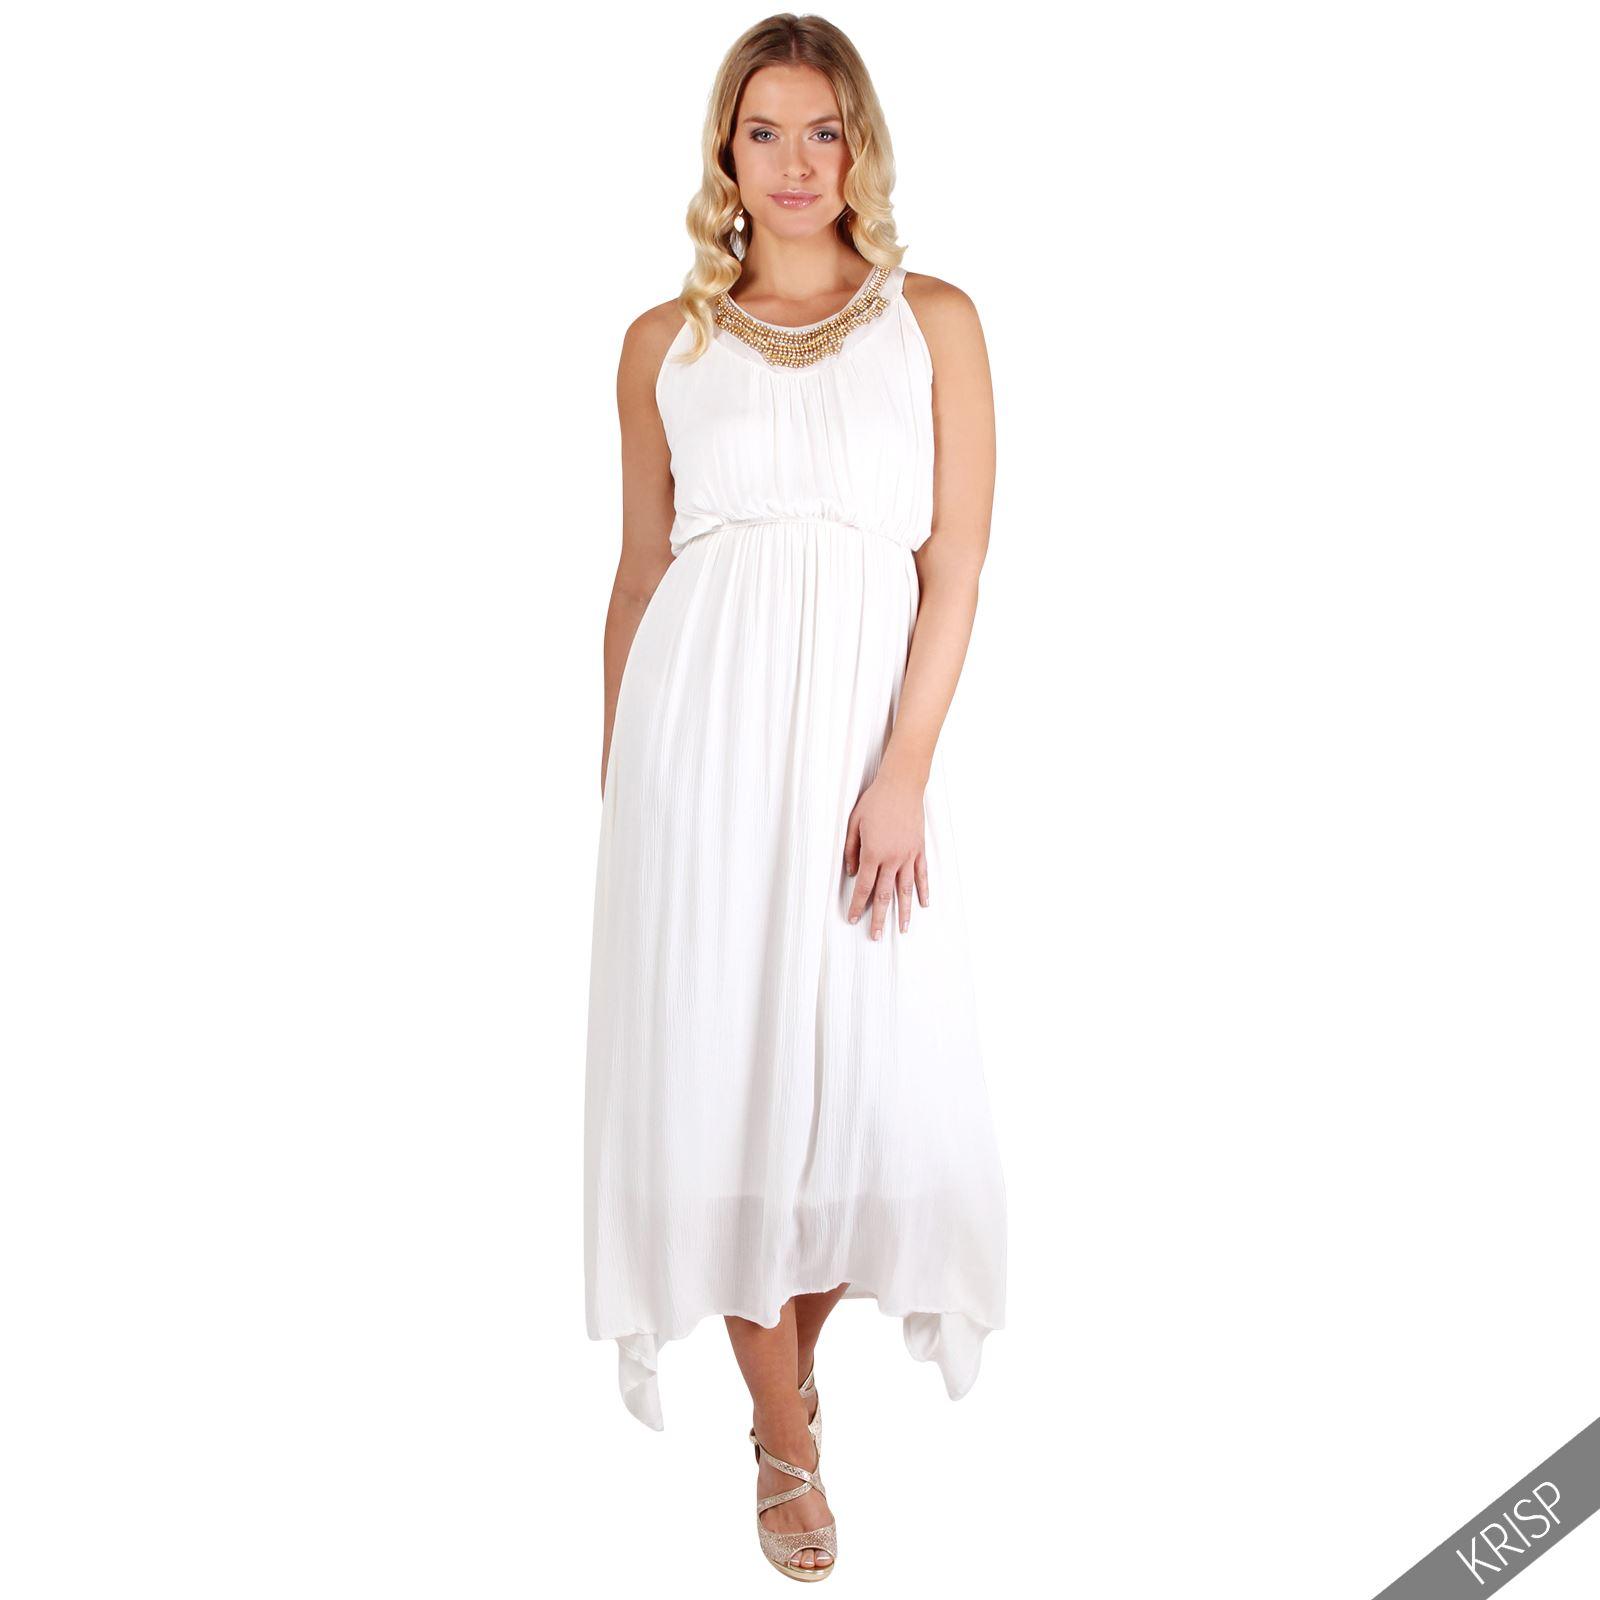 Wonderful Lace Summer Casual Evening Party Beach Dress Long Maxi Dress Plus Size LA | EBay